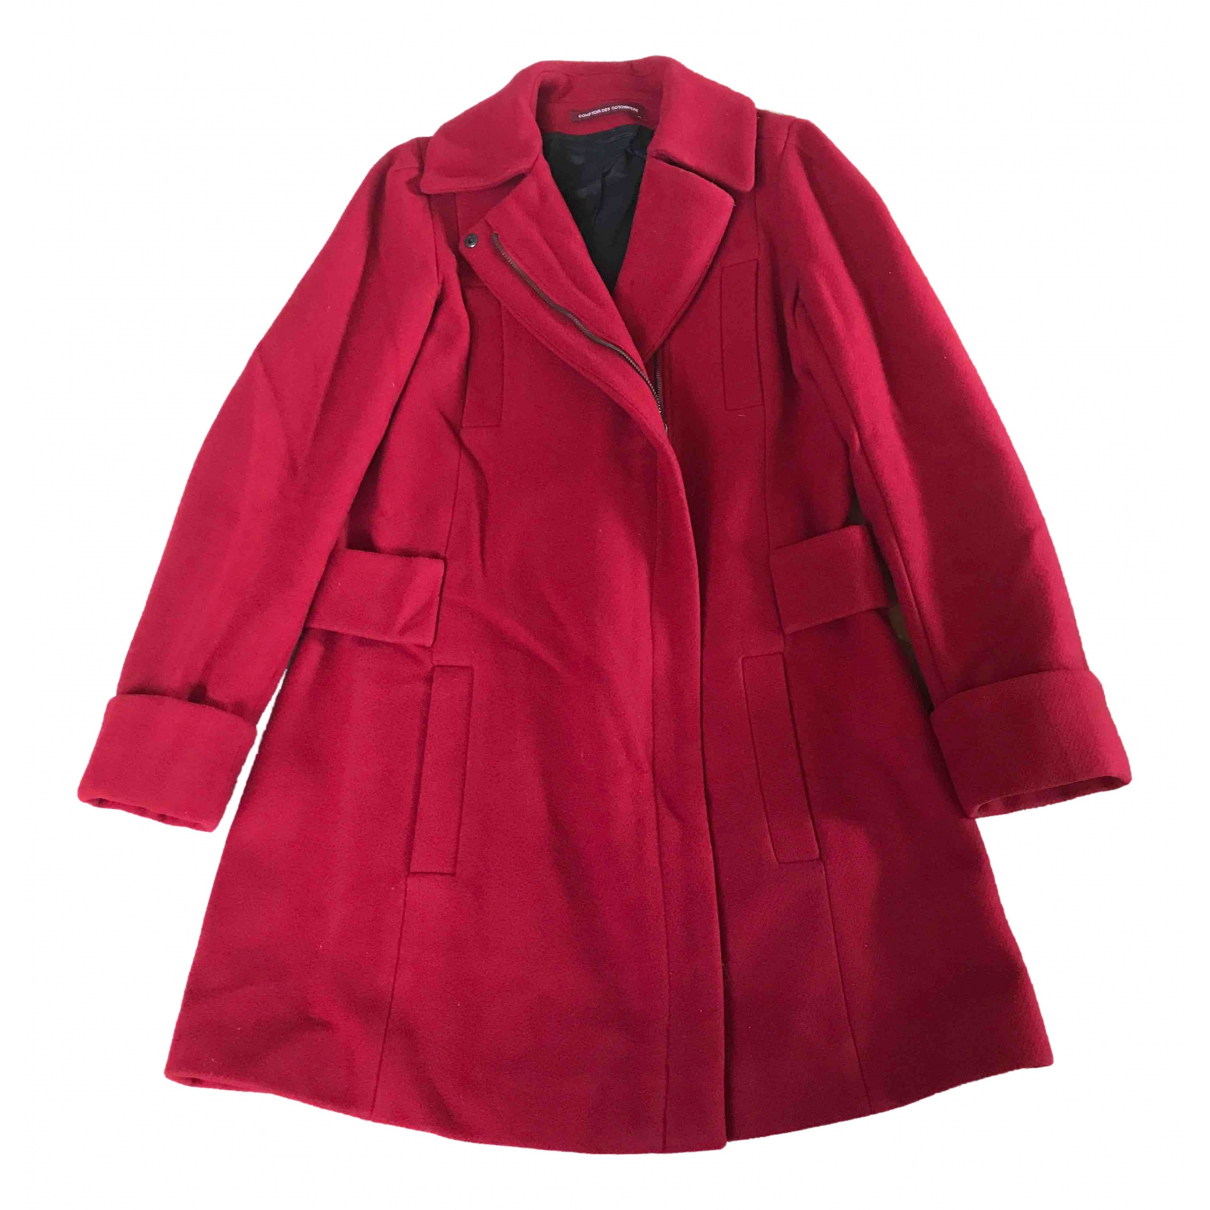 Comptoir Des Cotonniers \N Red Wool coat for Women 36 FR